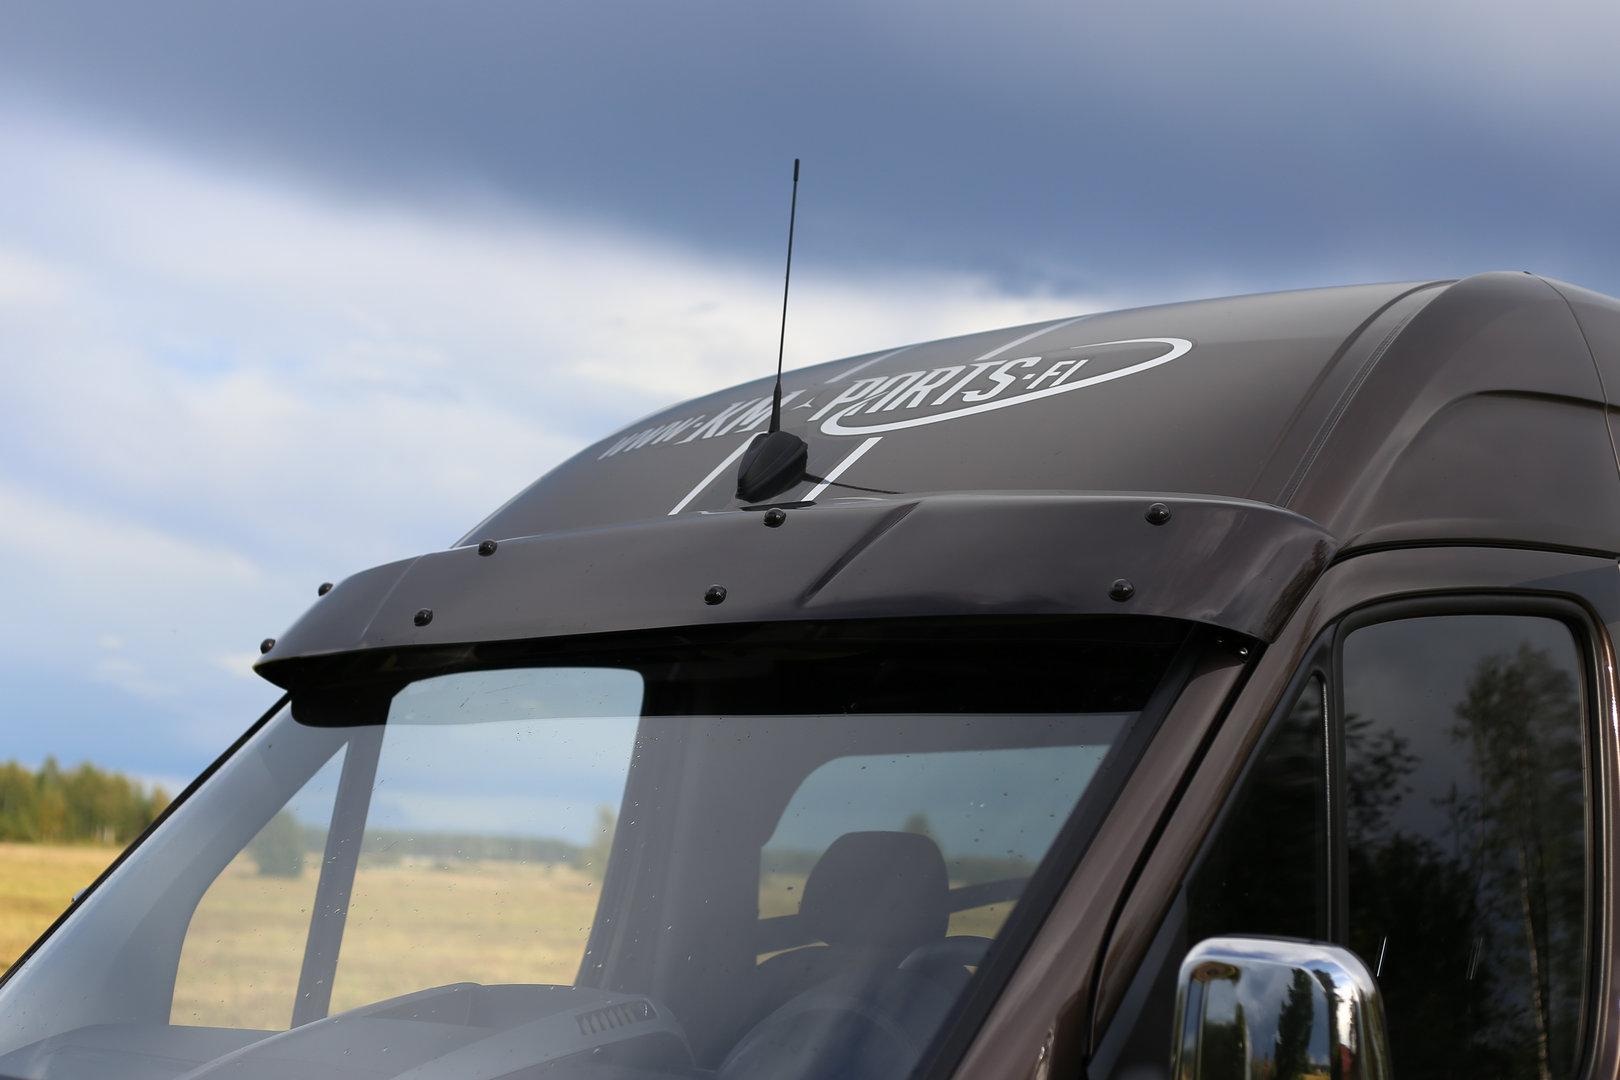 Sun visor for external installation car sun visor tuning TRANSIT 2014 VAN